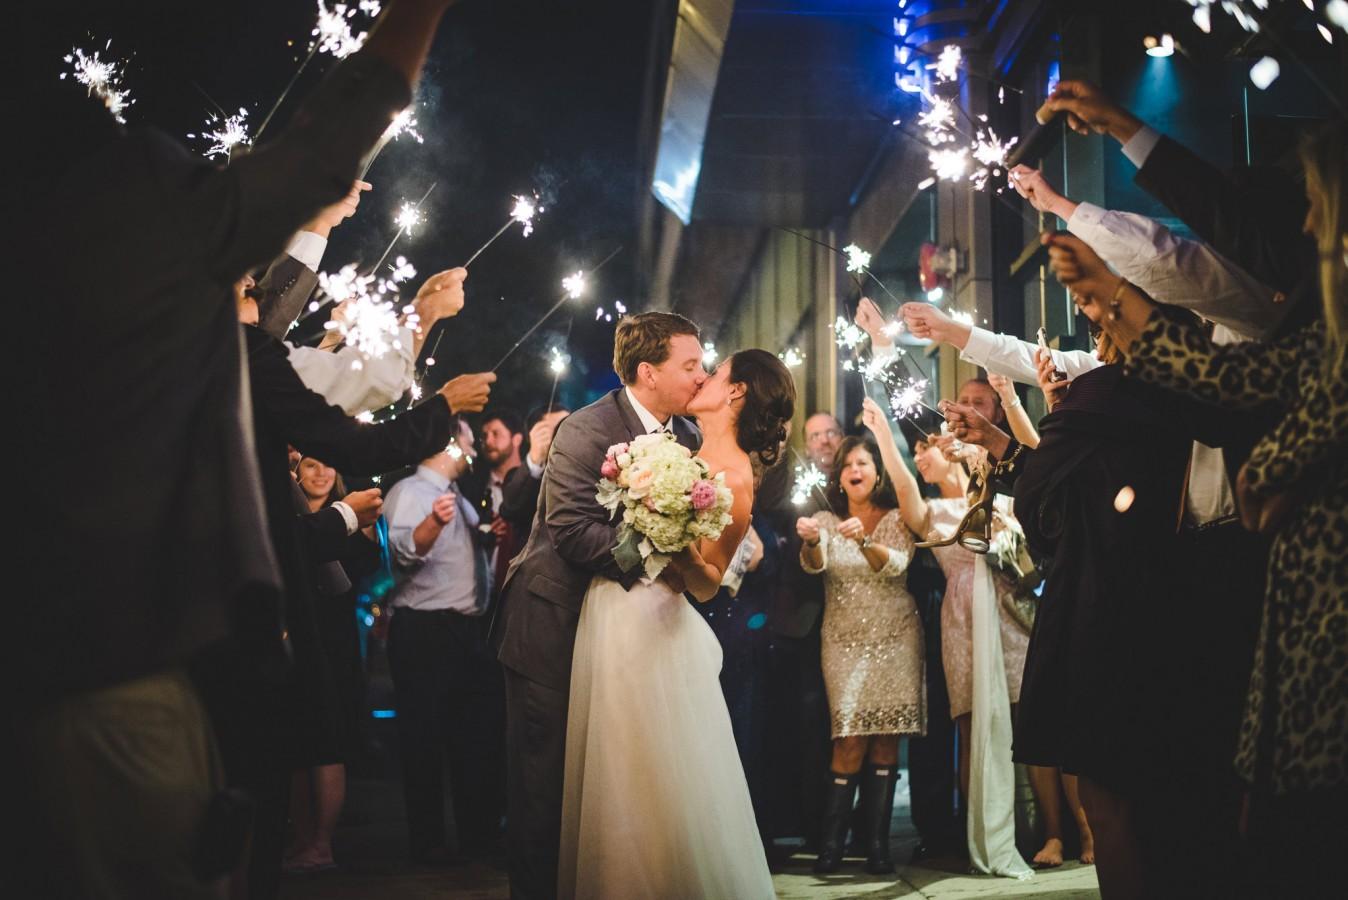 fete-photography-weddings-018